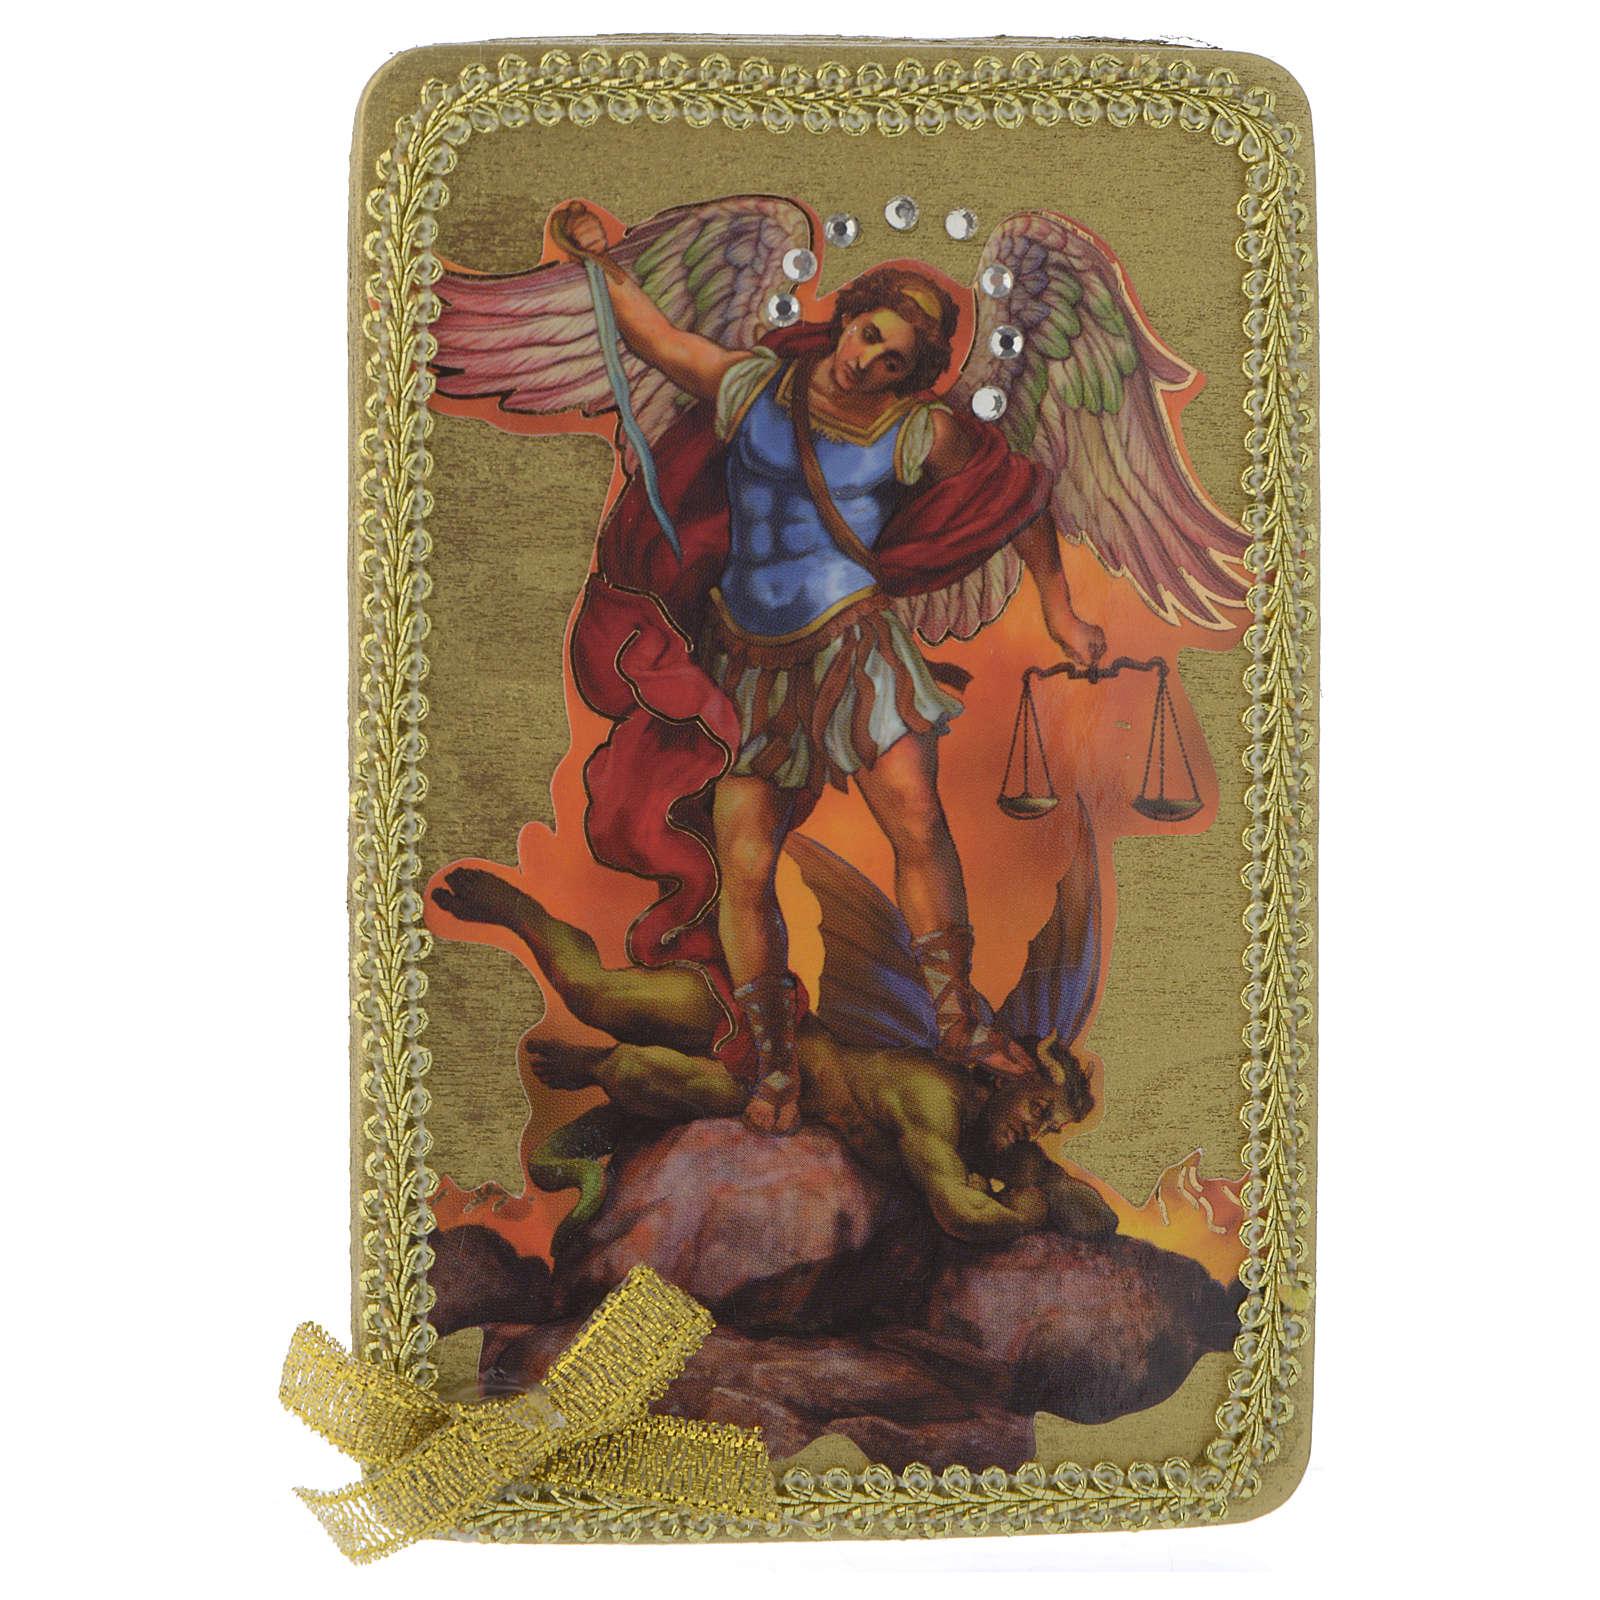 Saint Michael image in wood 3